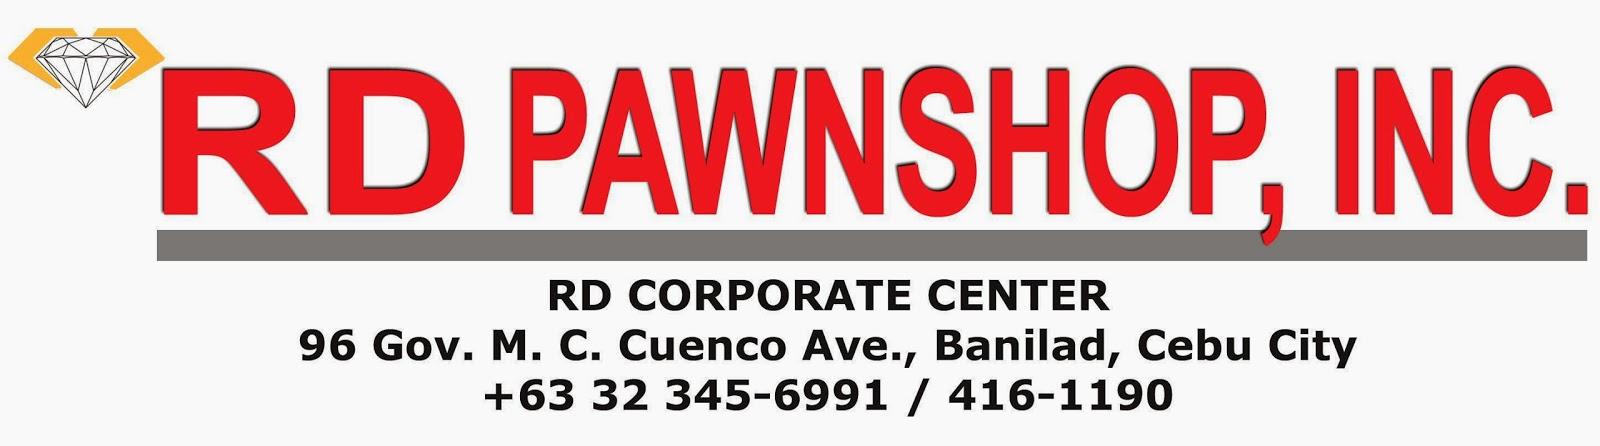 RD Pawnshop logo